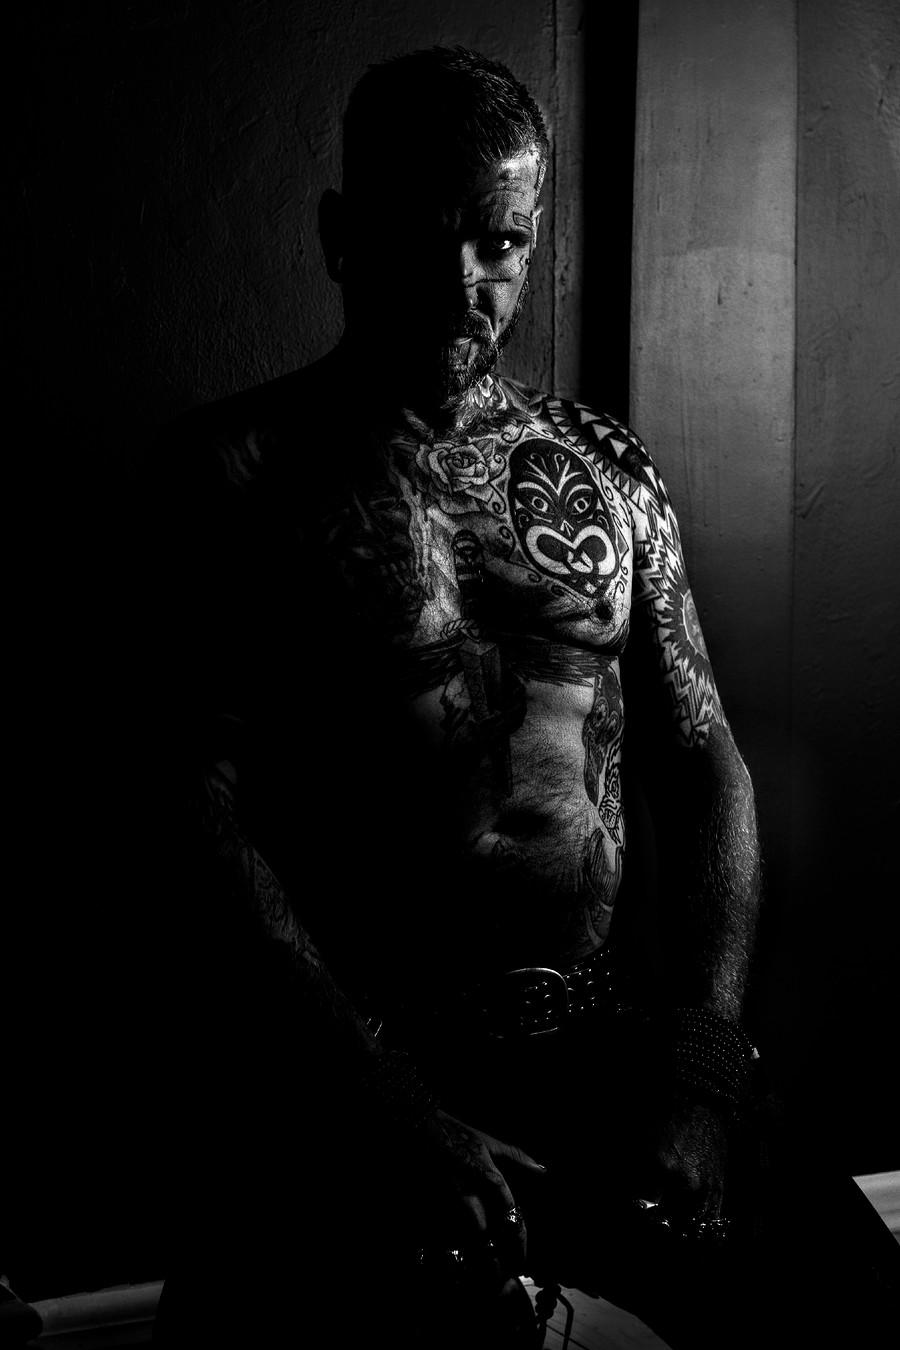 Model Mark J Timms / Uploaded 6th February 2020 @ 12:33 PM